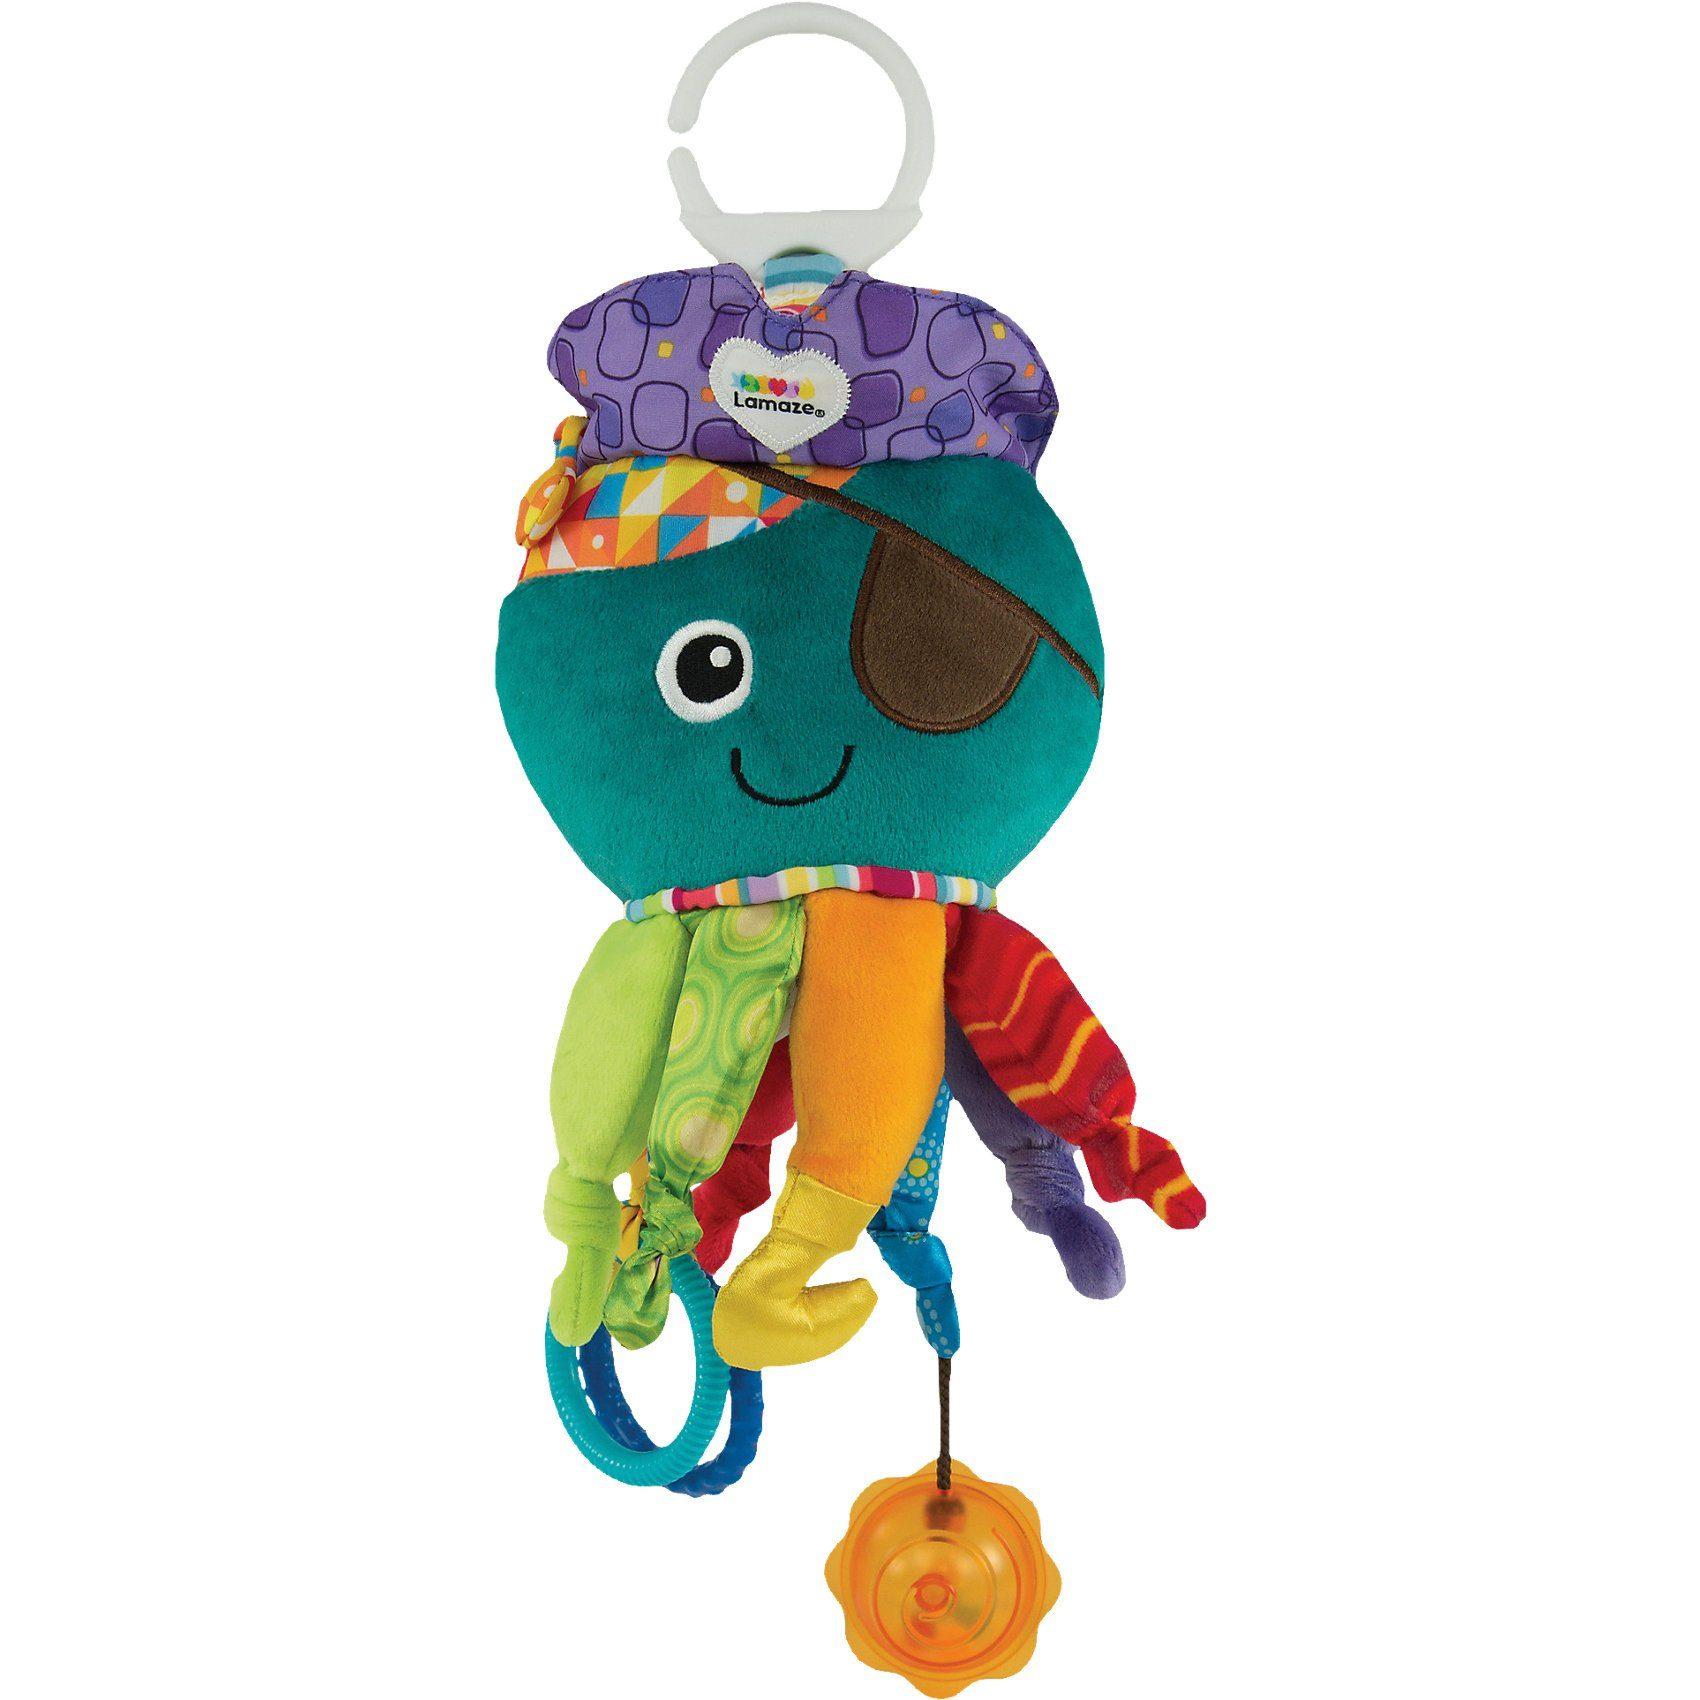 Lamaze Spieltier - Captain Calamari der Piratenkrake